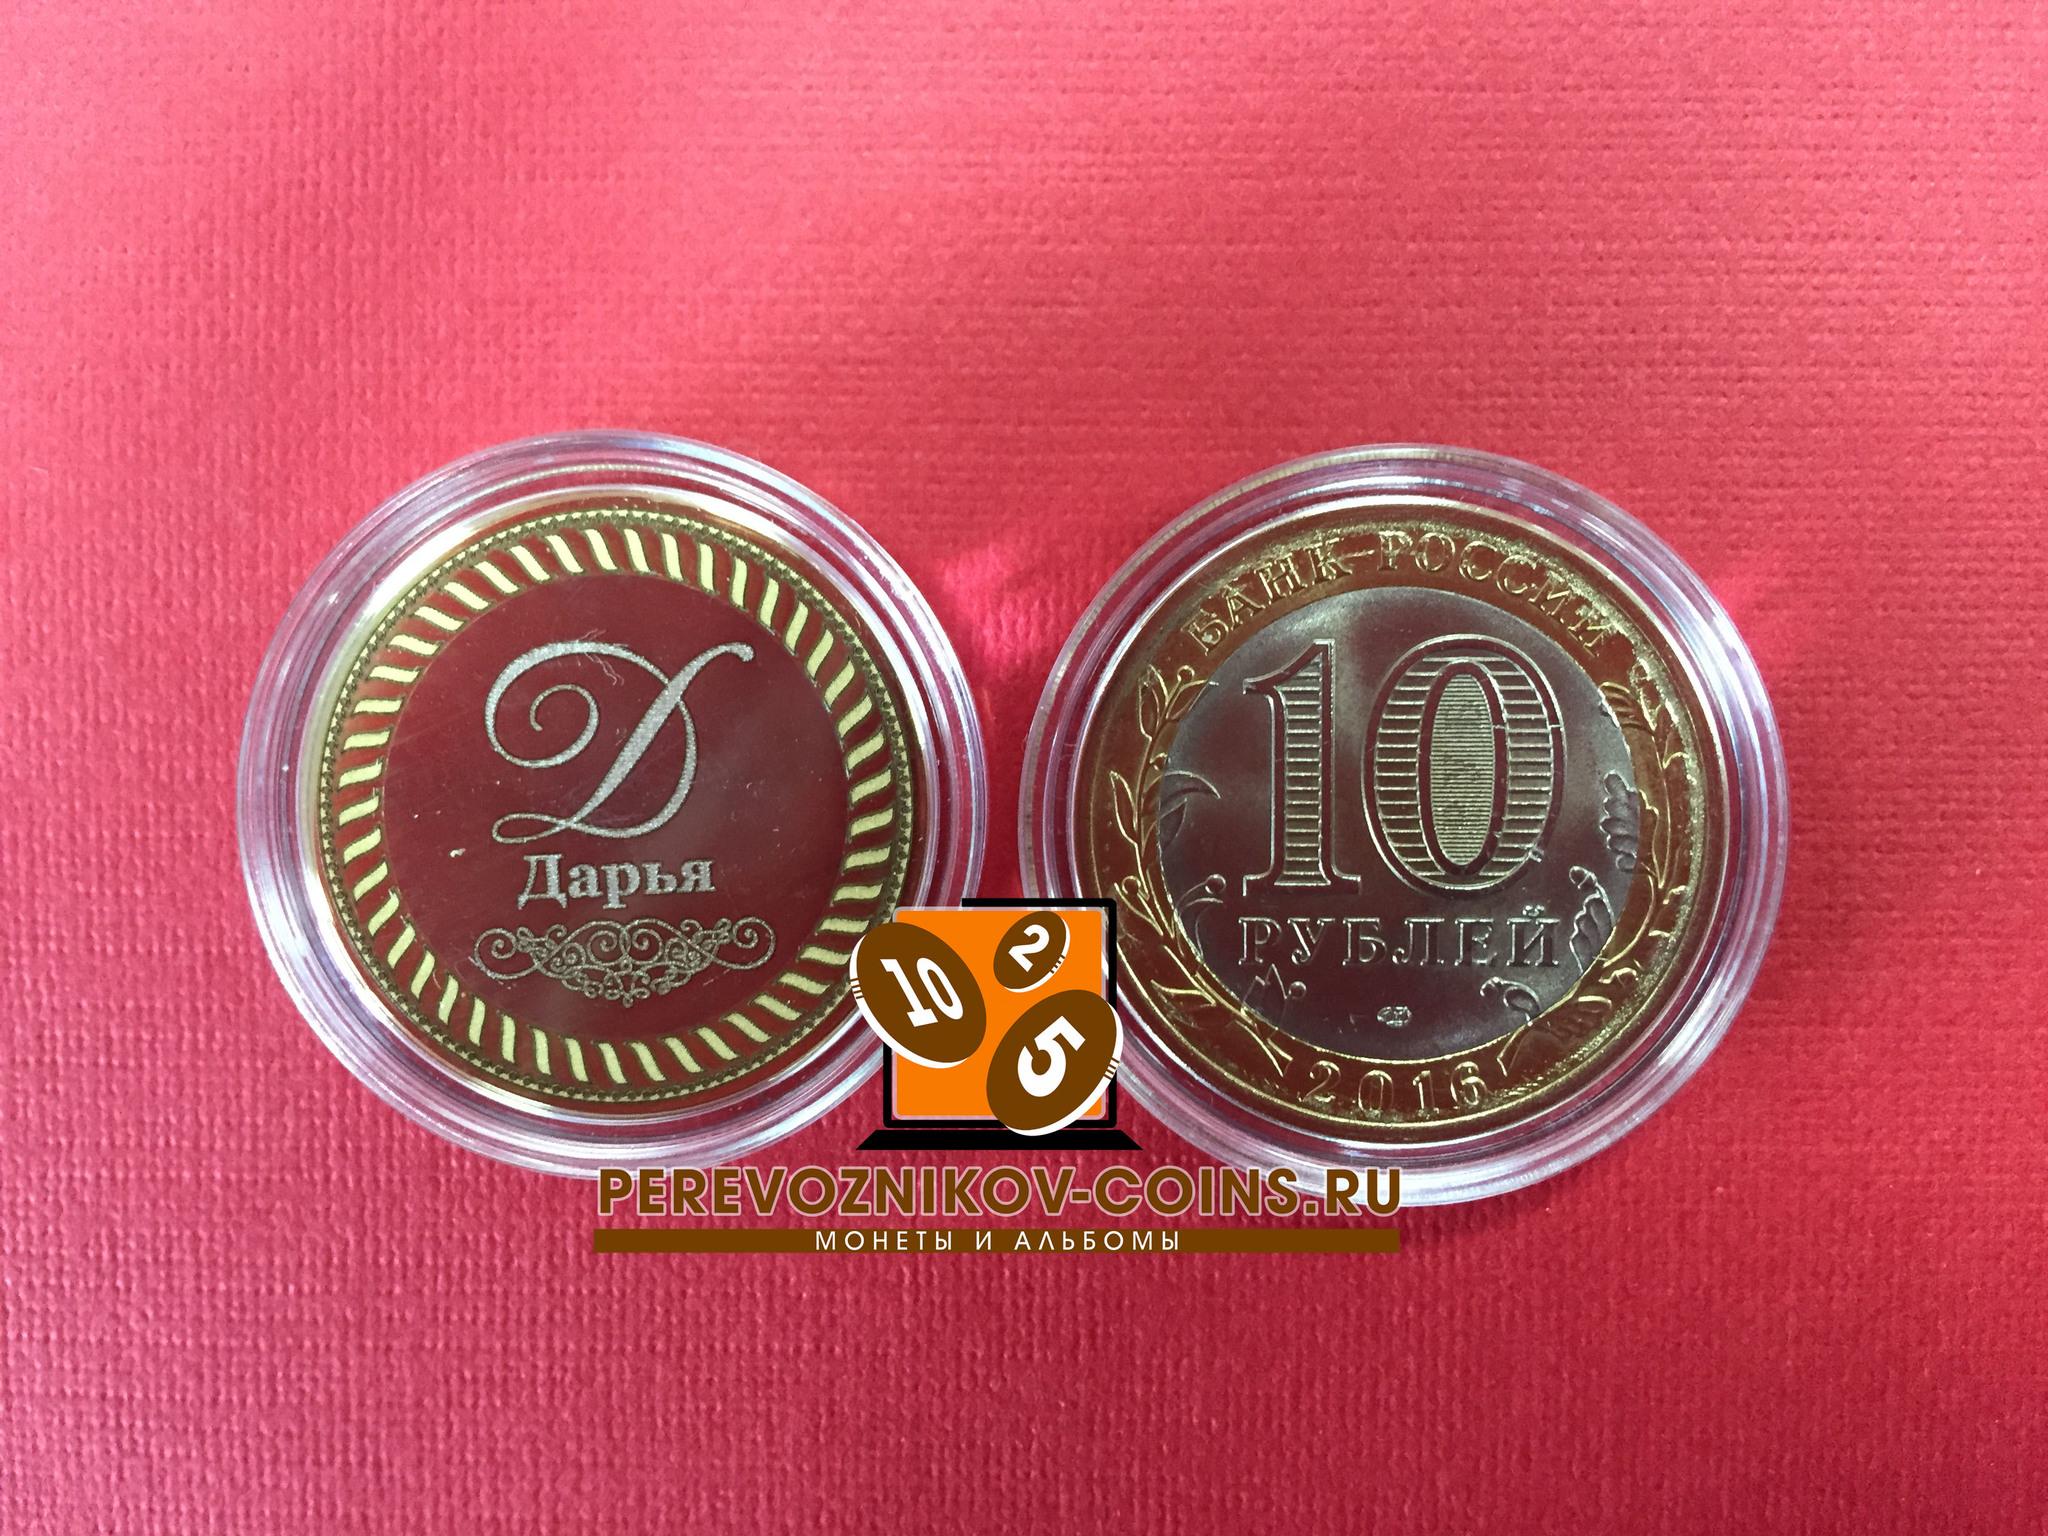 Дарья. Гравированная монета 10 рублей